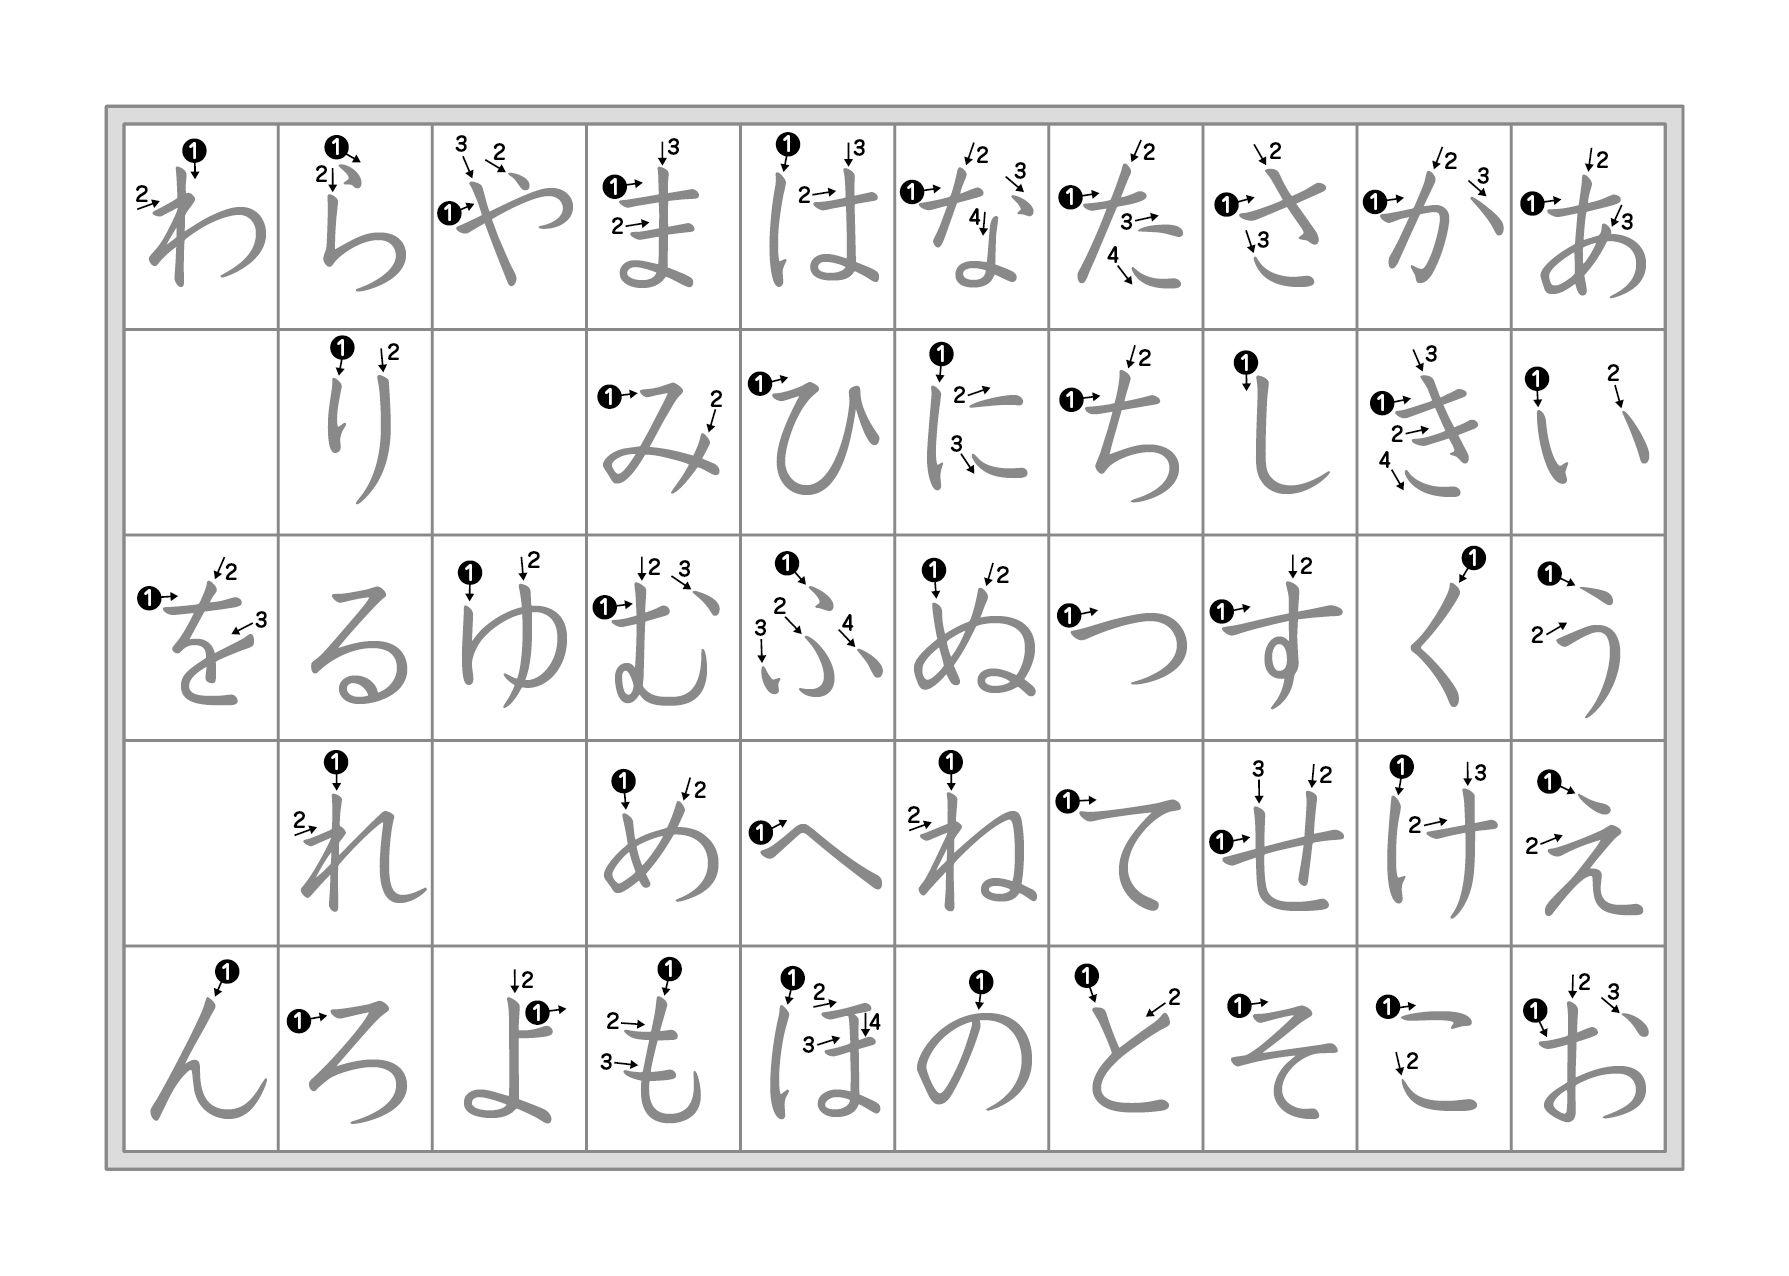 sasagami358 s hiragana stroke order chart [ 1789 x 1276 Pixel ]